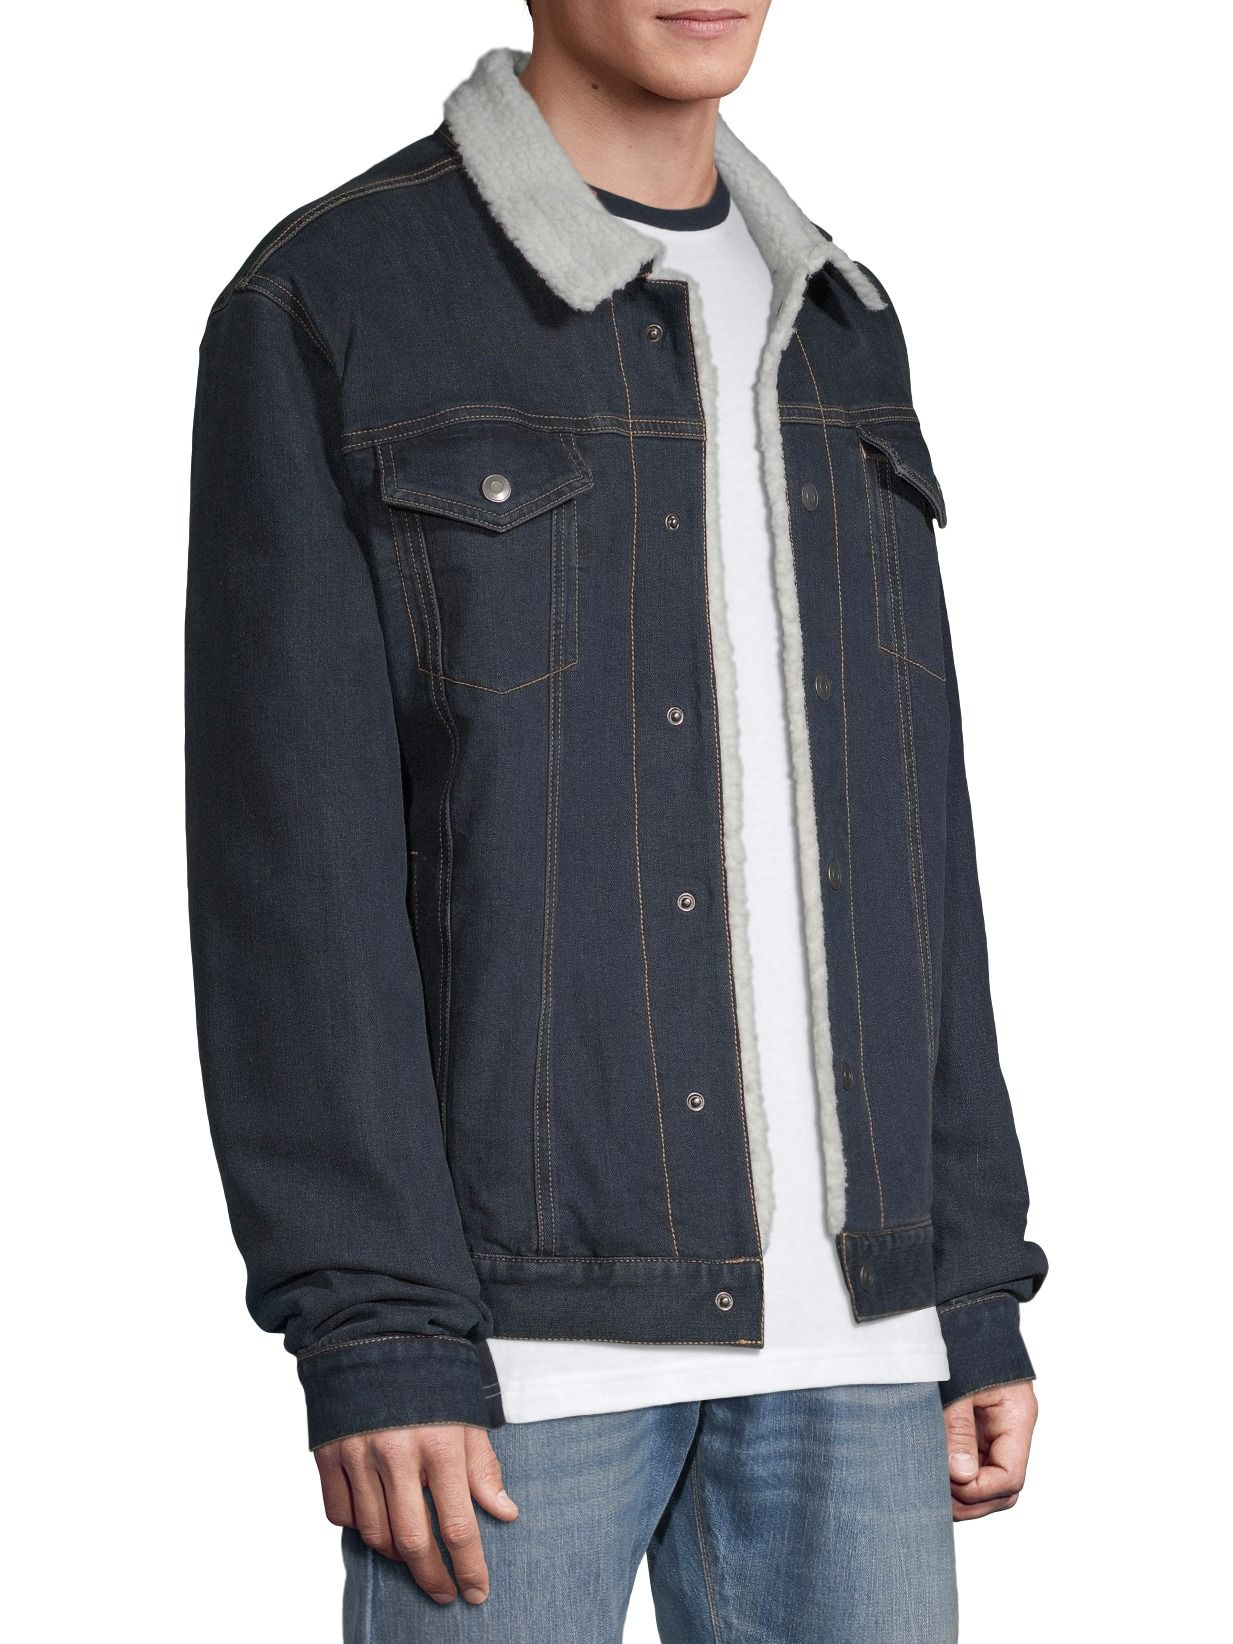 George George Men S And Big Men S Sherpa Lined Denim Jacket Up To Size 5xl Walmart Com Sherpa Lined Denim Jacket Denim Jacket Sherpa Lined Jacket [ 1644 x 1233 Pixel ]